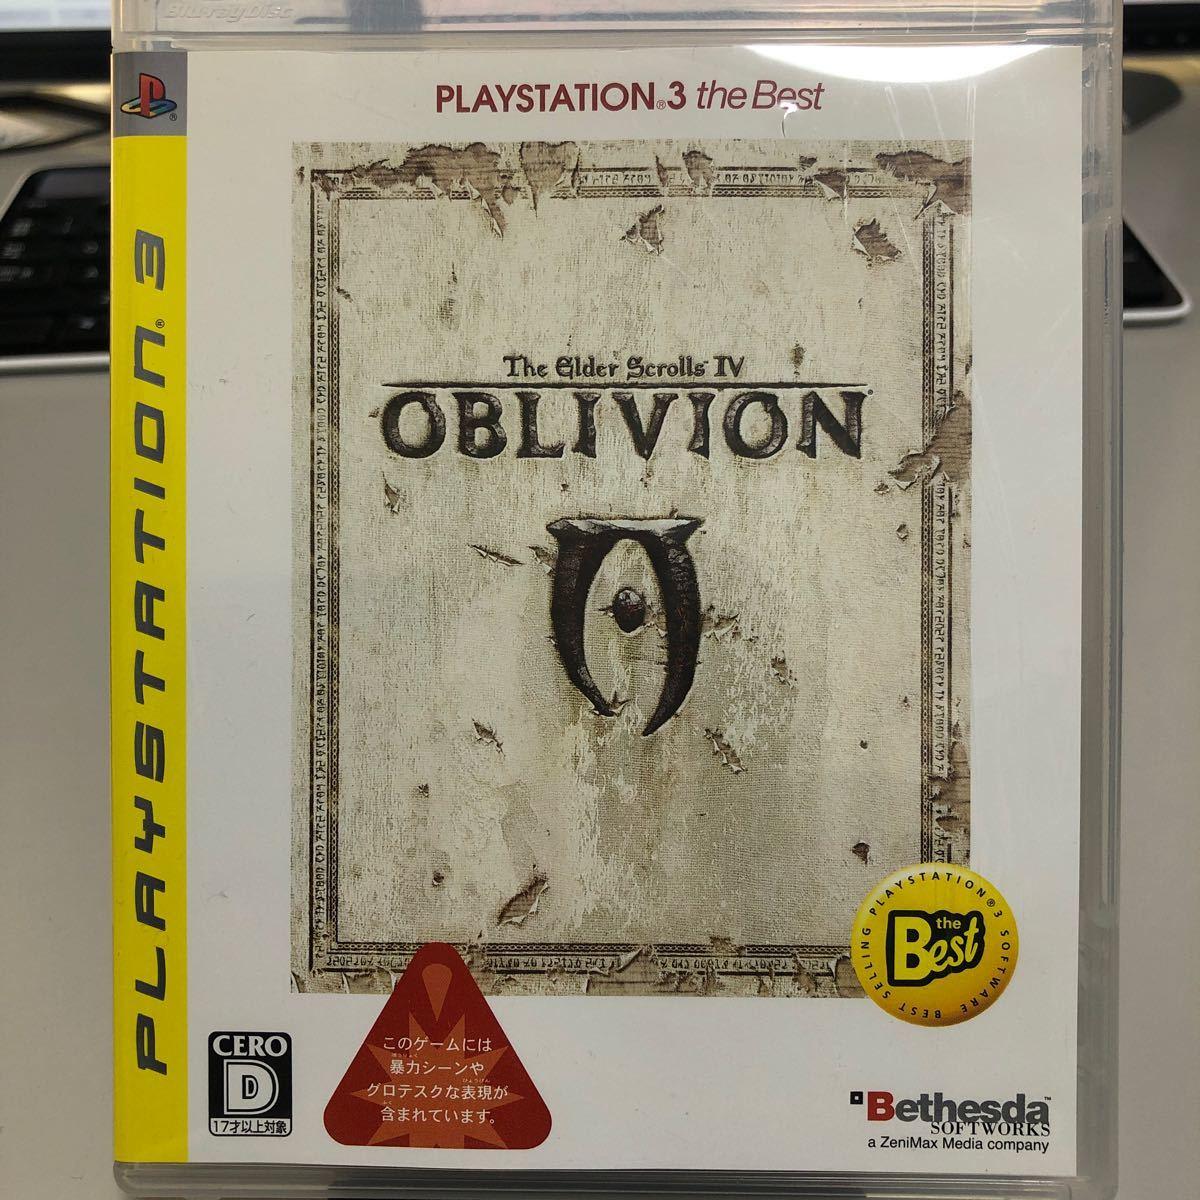 【PS3】 The Elder Scrolls IV:オブリビオン [PS3 the Best]